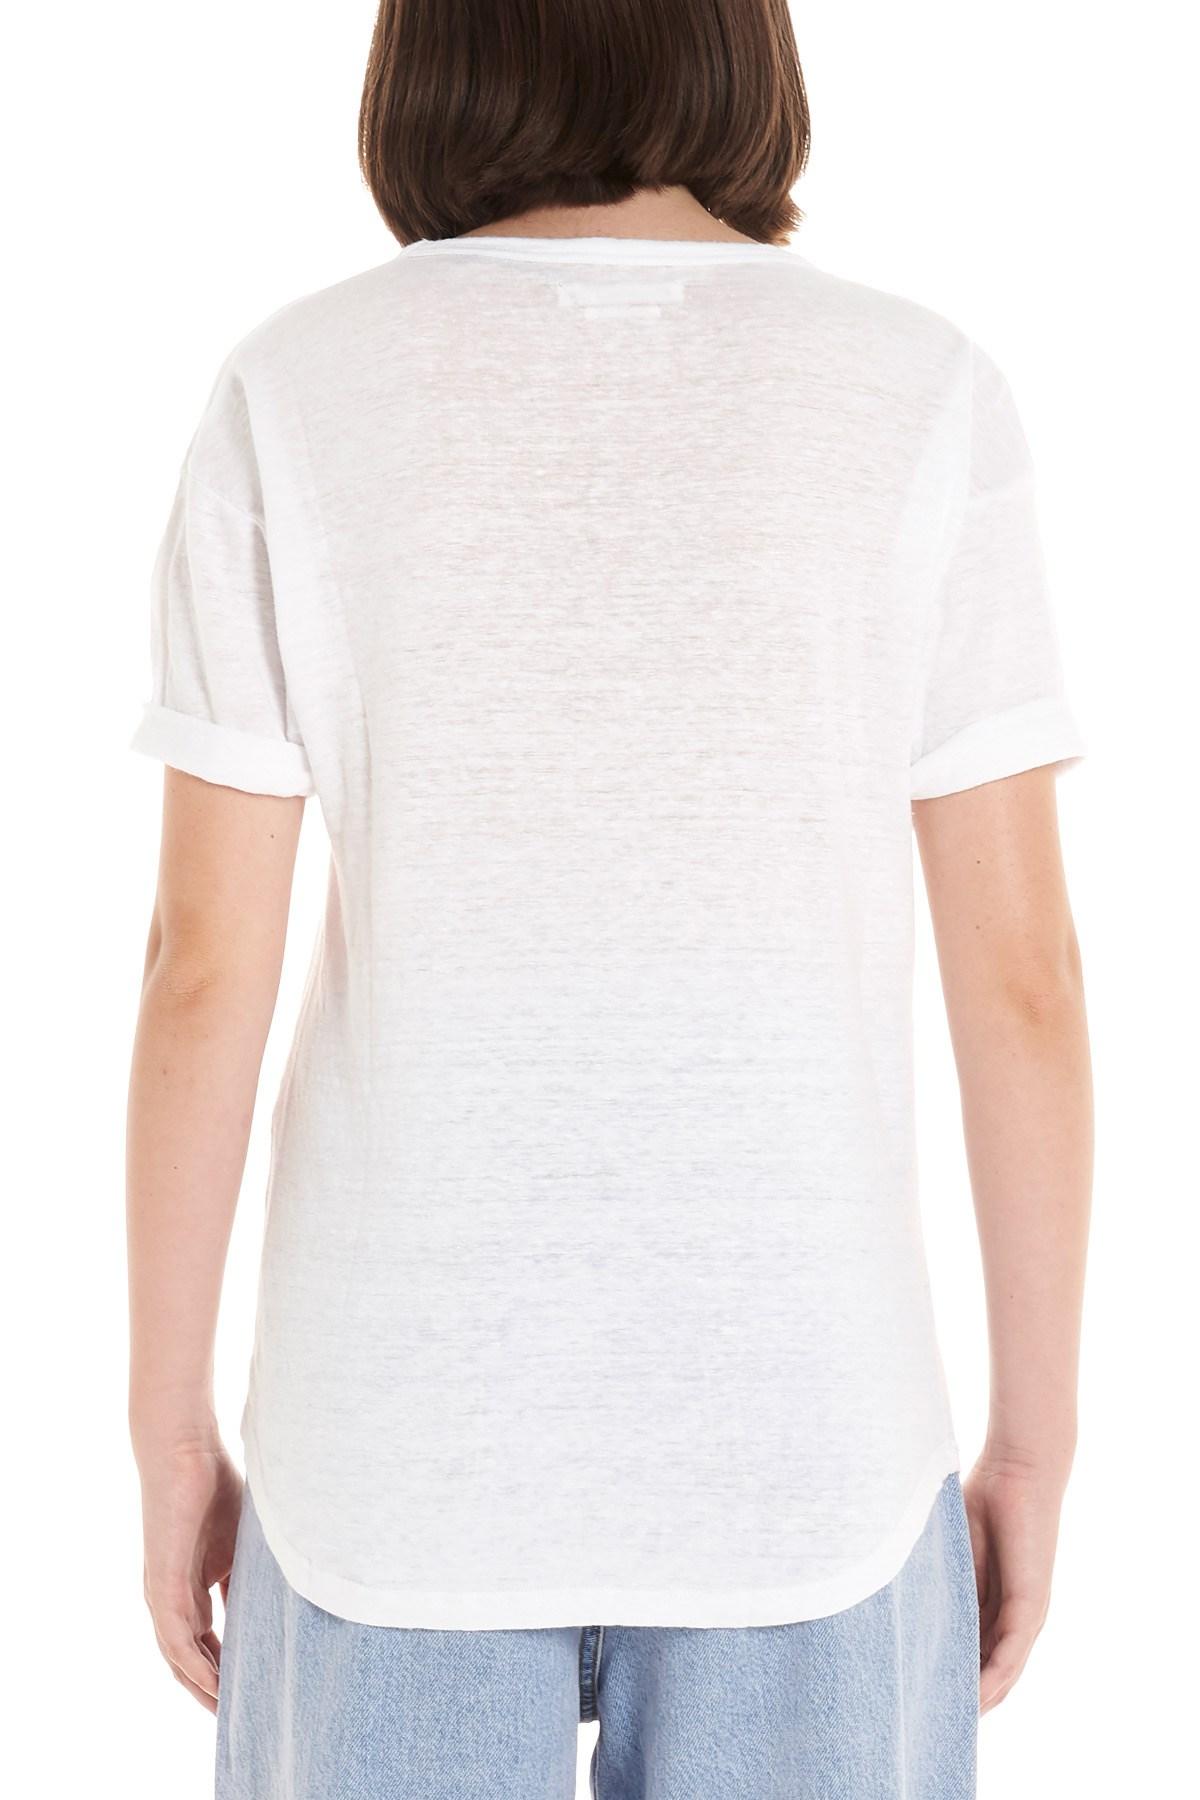 Isabel Marant étoile Koldi T Shirt Available On Wwwjulian